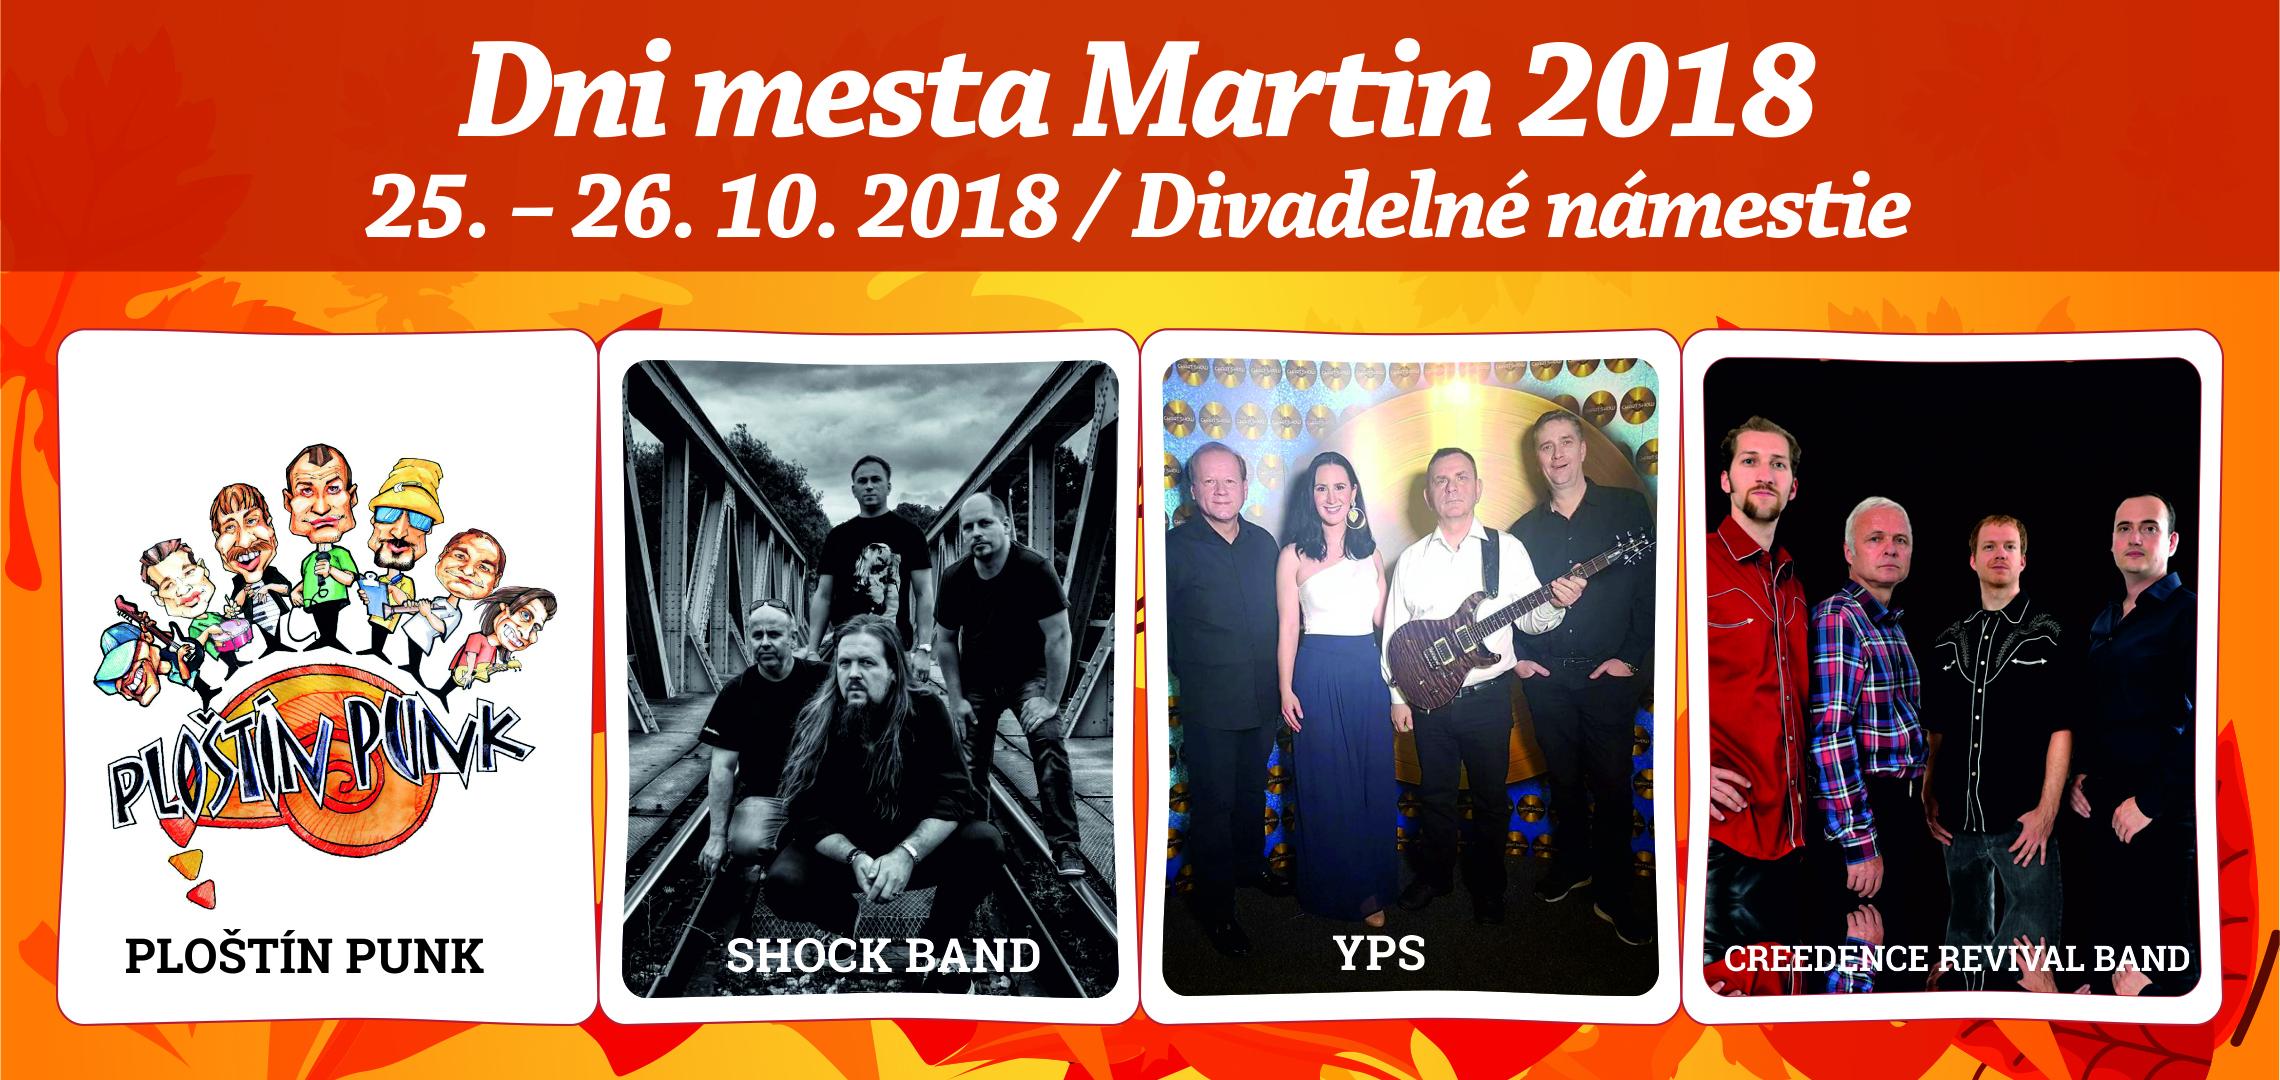 Dni mesta Martin 2018